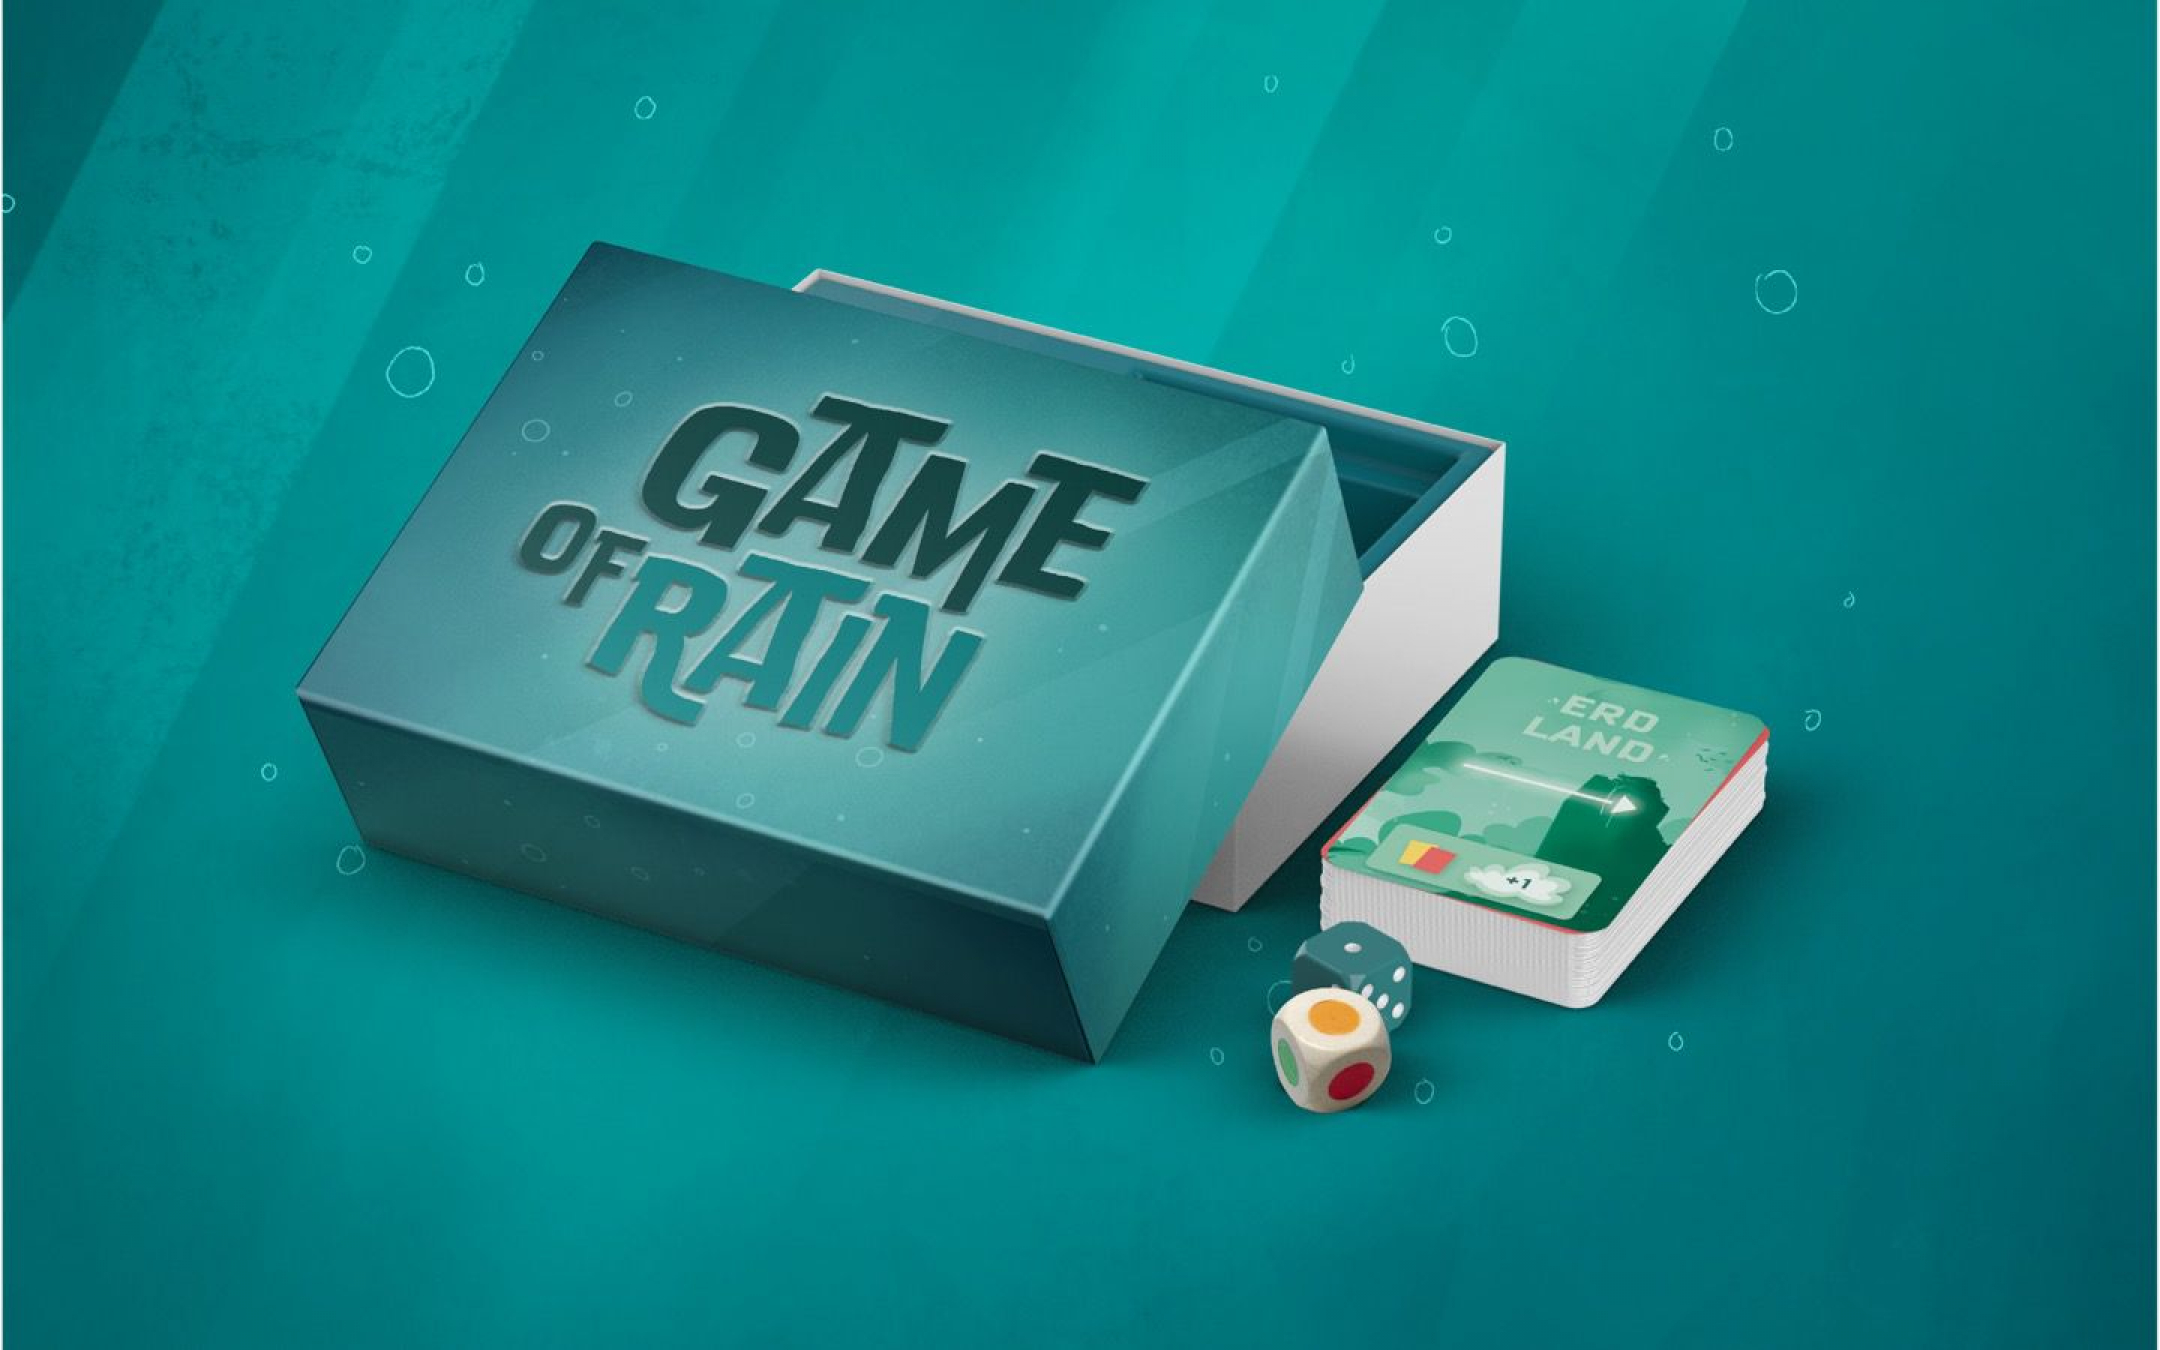 Game of Rain